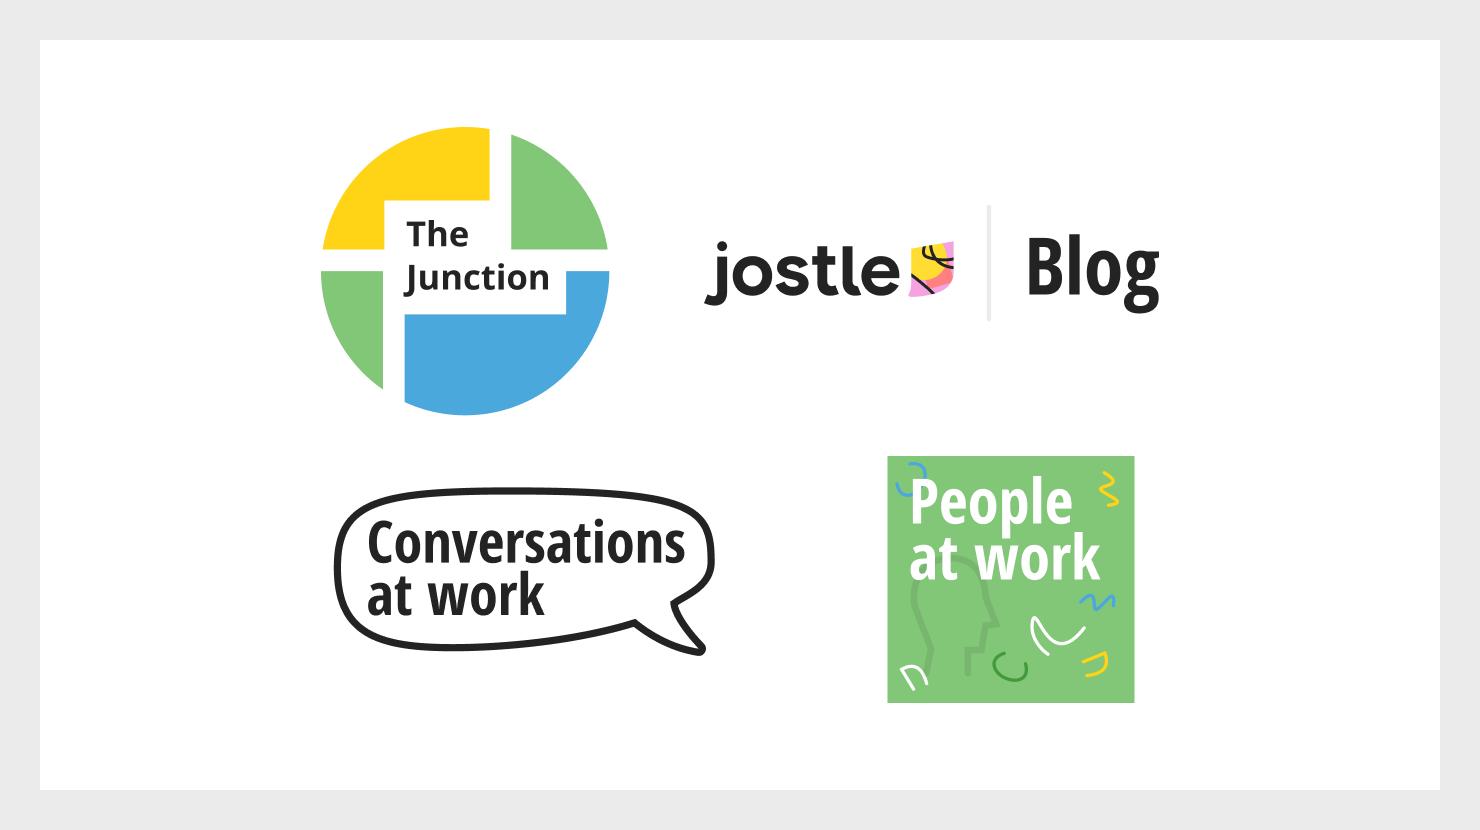 jostle blog community destinations